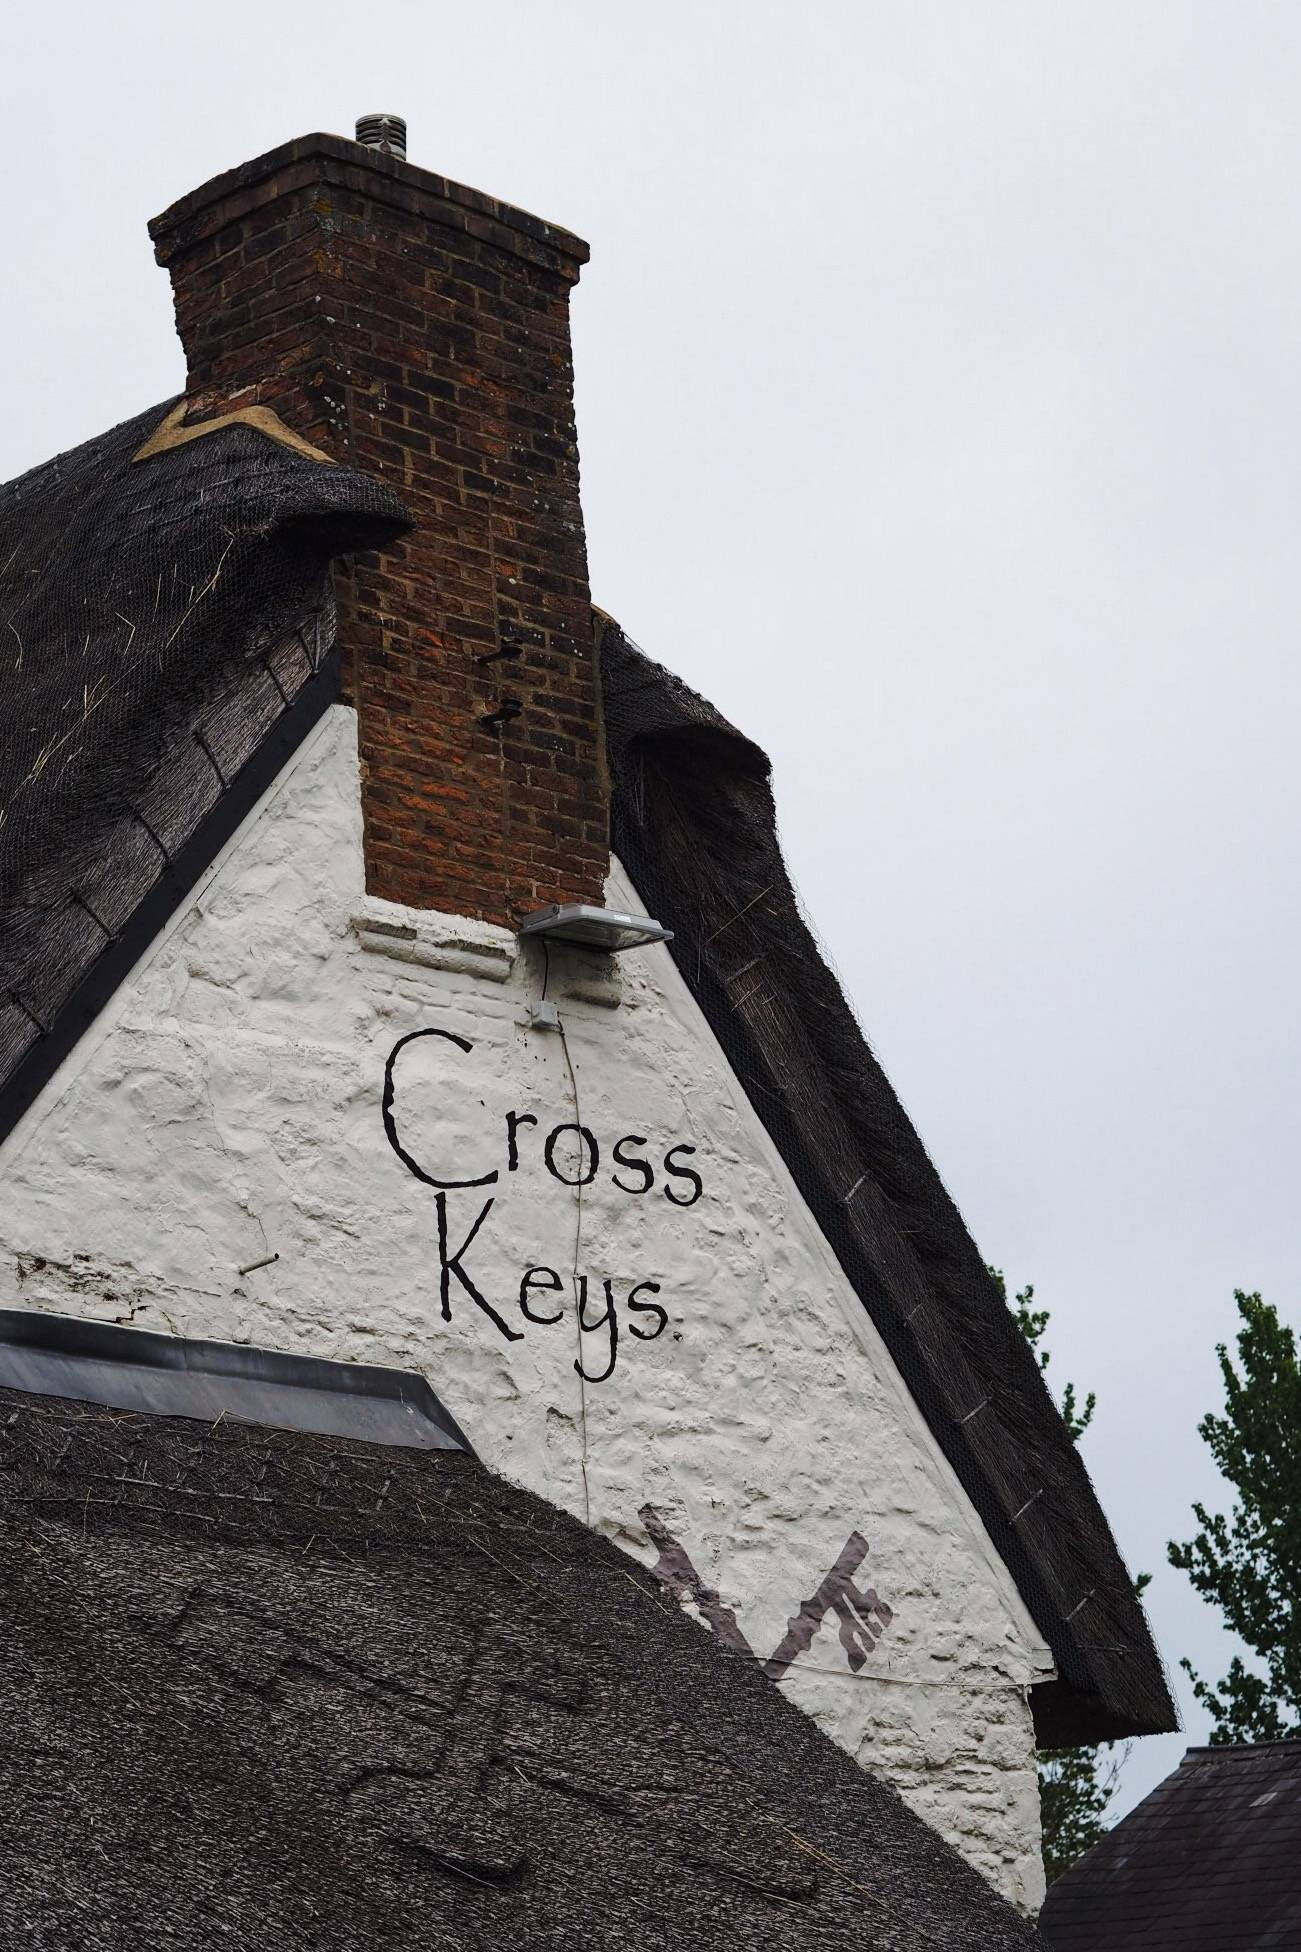 Cross_Keys_Milton_Keynes_Woolstone_review